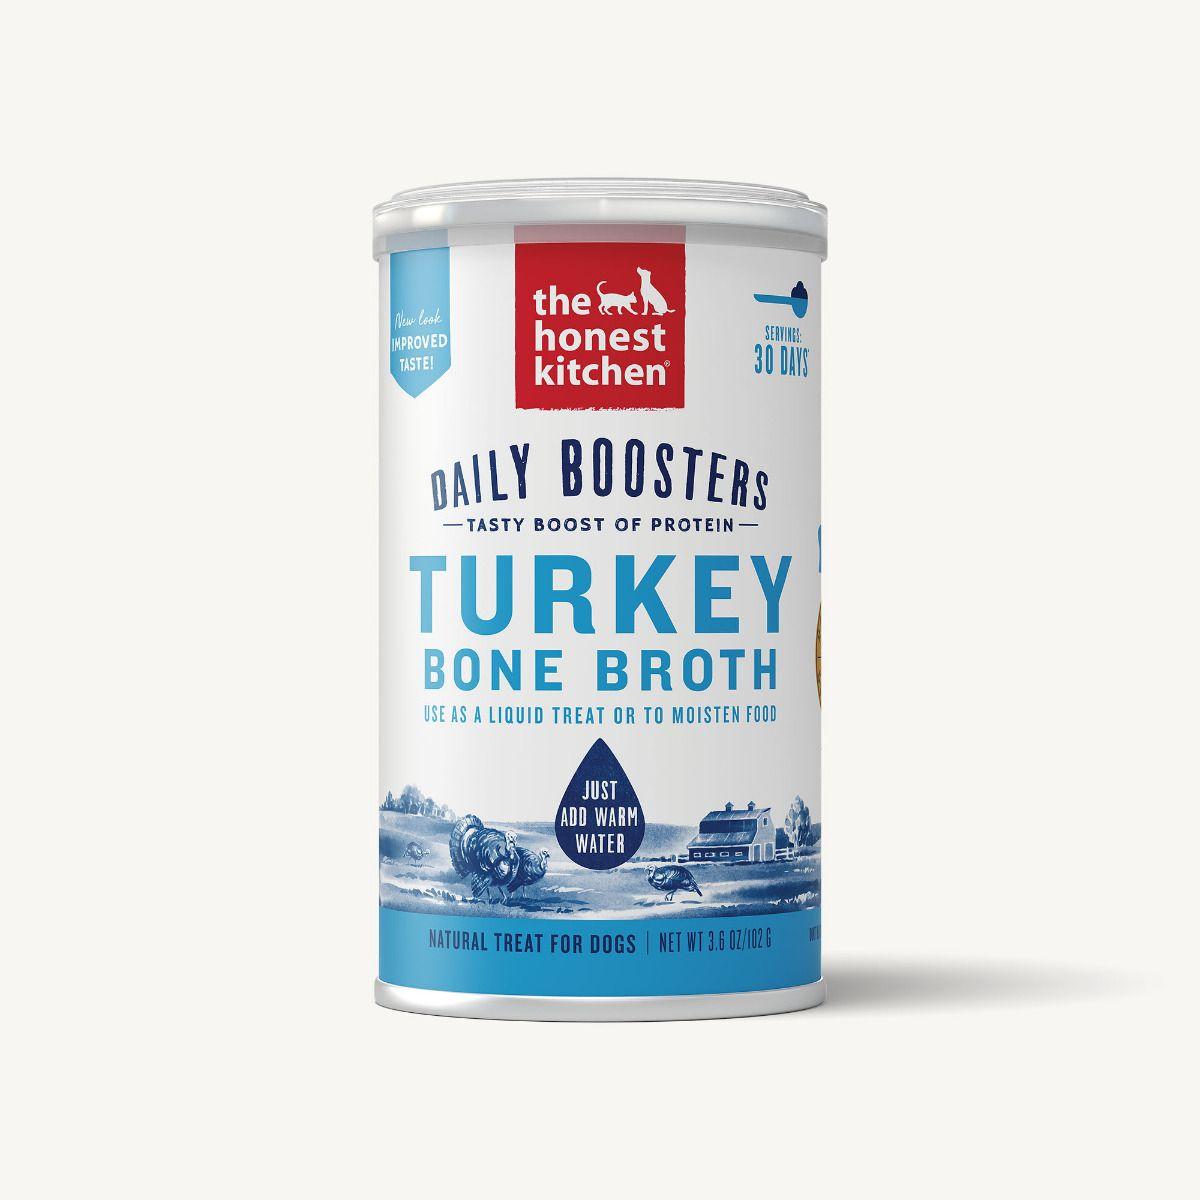 The Honest Kitchen Instant Bone Broth Turkey & Turmeric, 3.6-oz